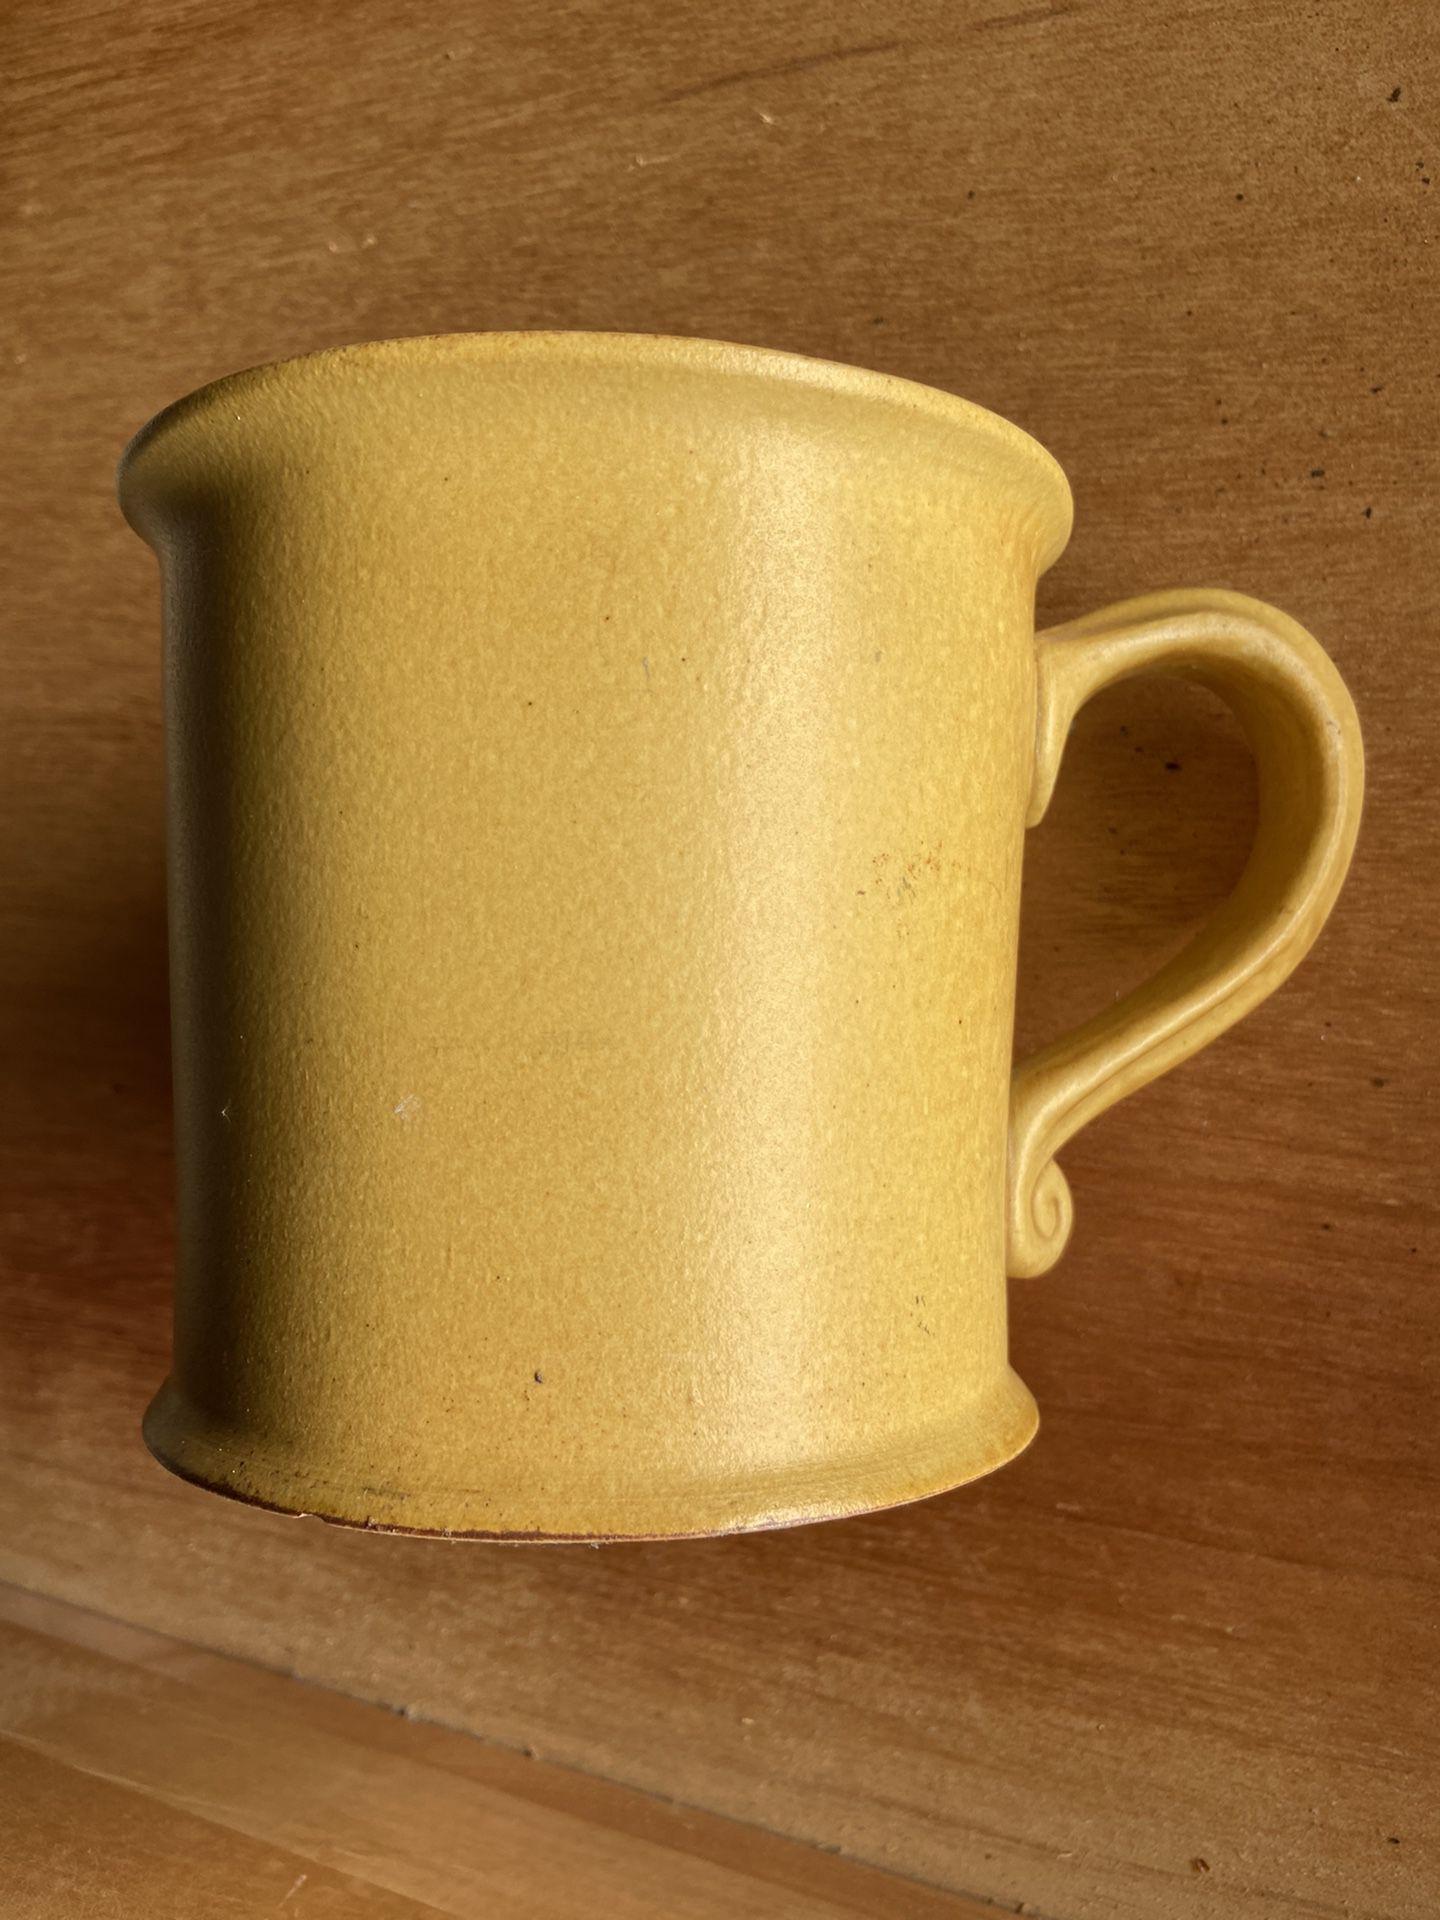 Bennington Vermont  Potters Coffee Mug